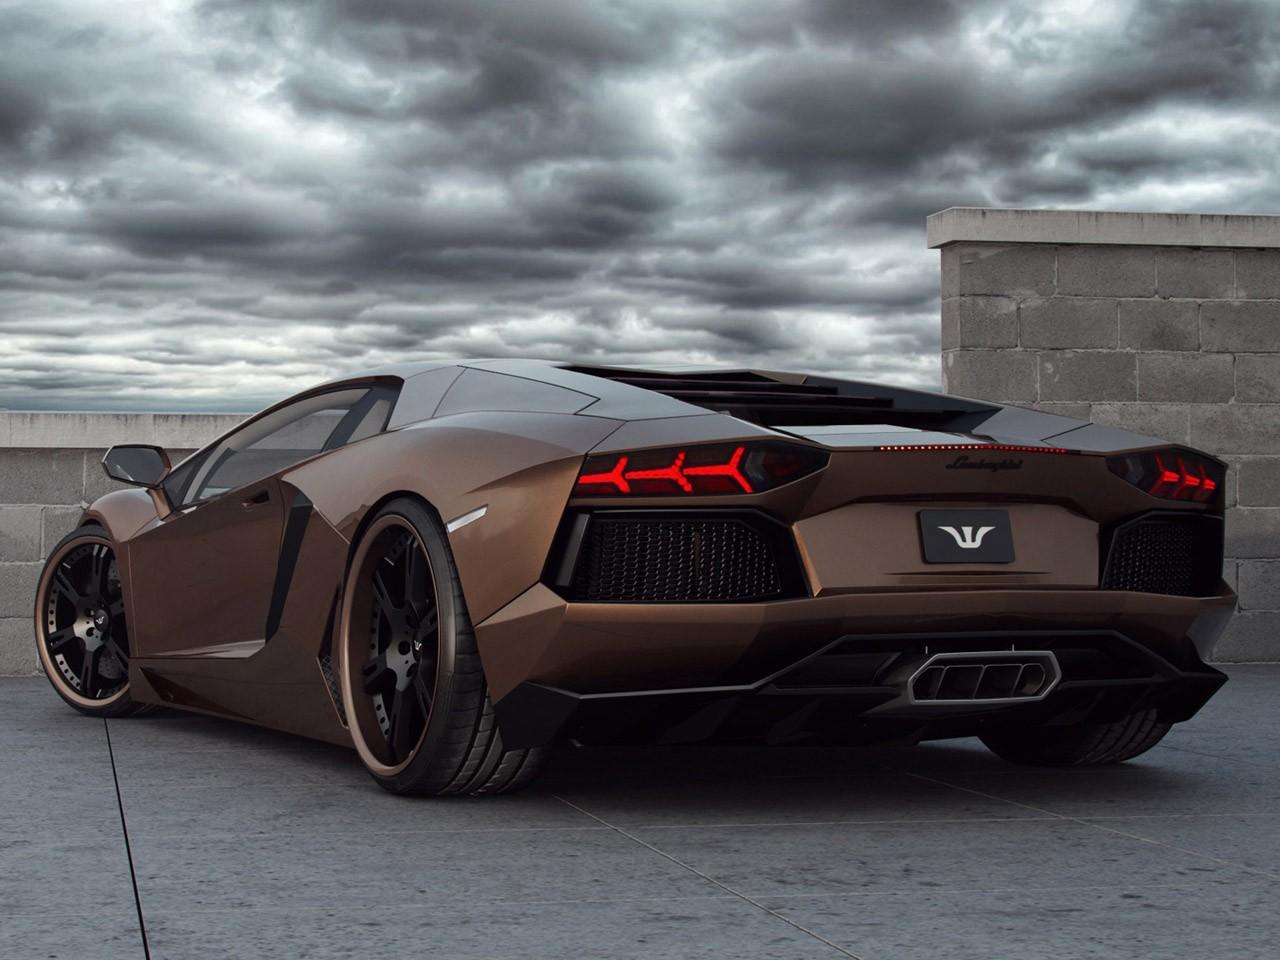 2012 Wheelsandmore Lamborghini Aventador Rabbioso